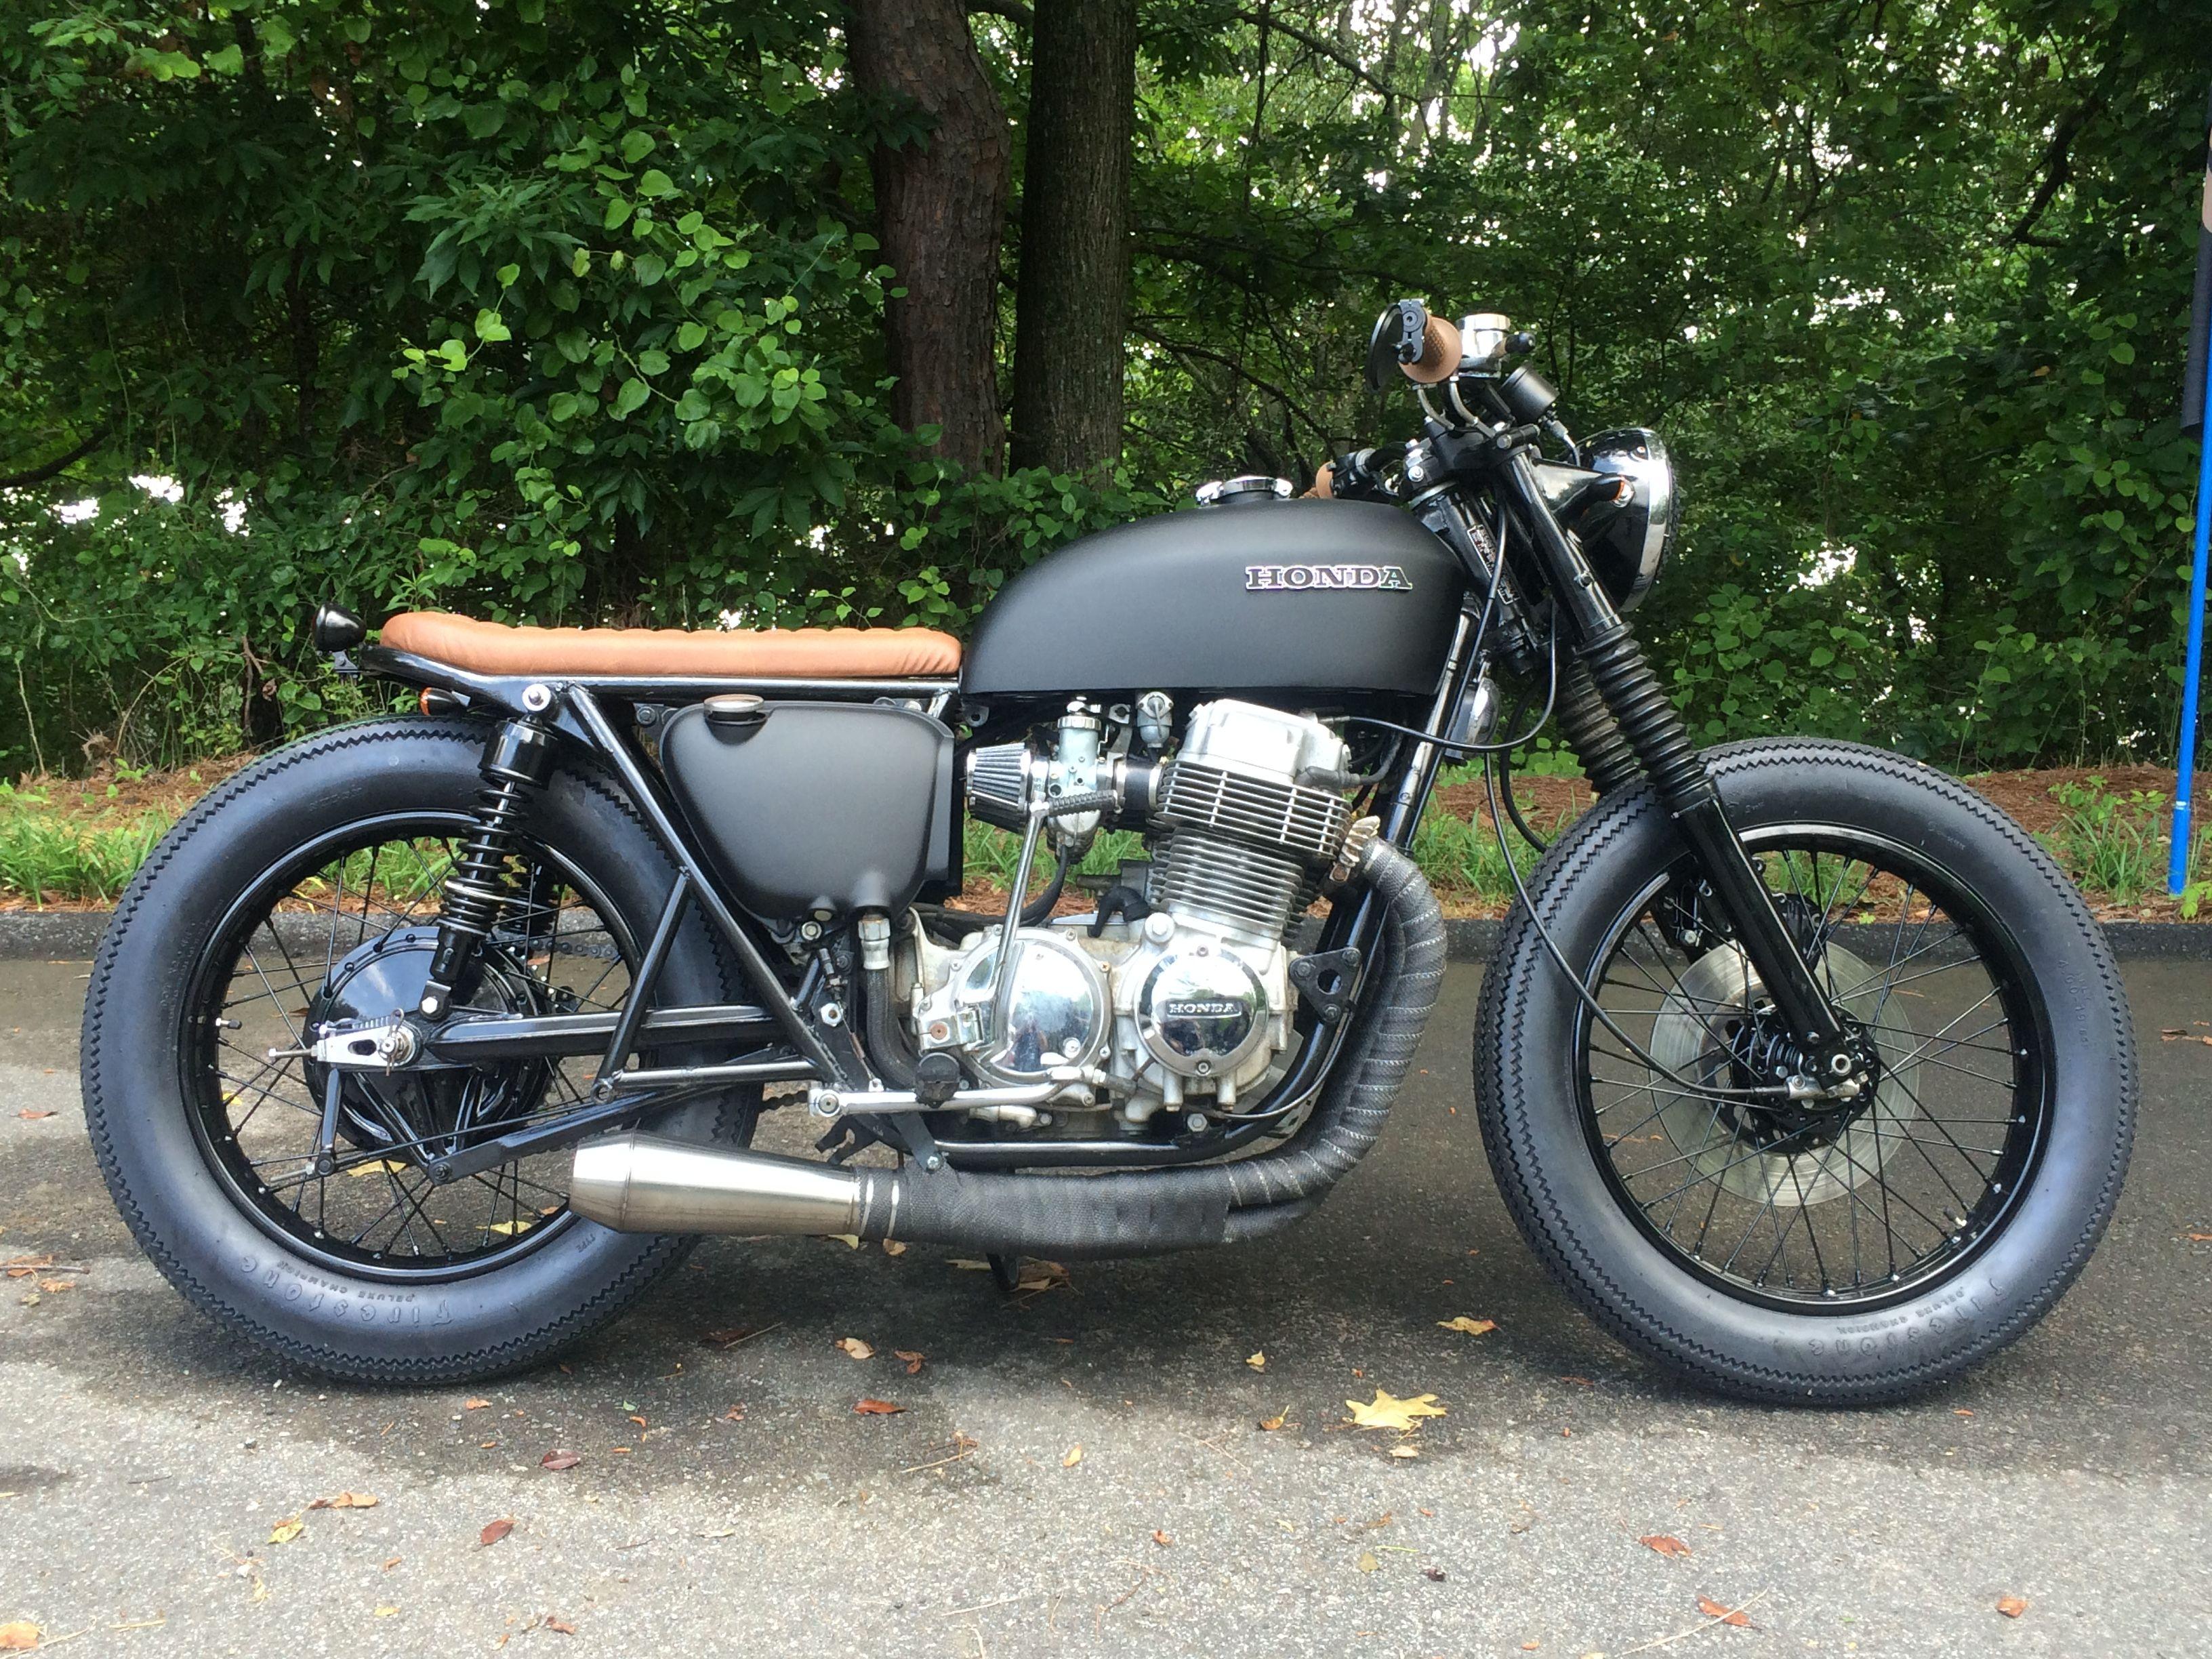 hight resolution of custom honda cb750 brat by atlanta motorcycle works